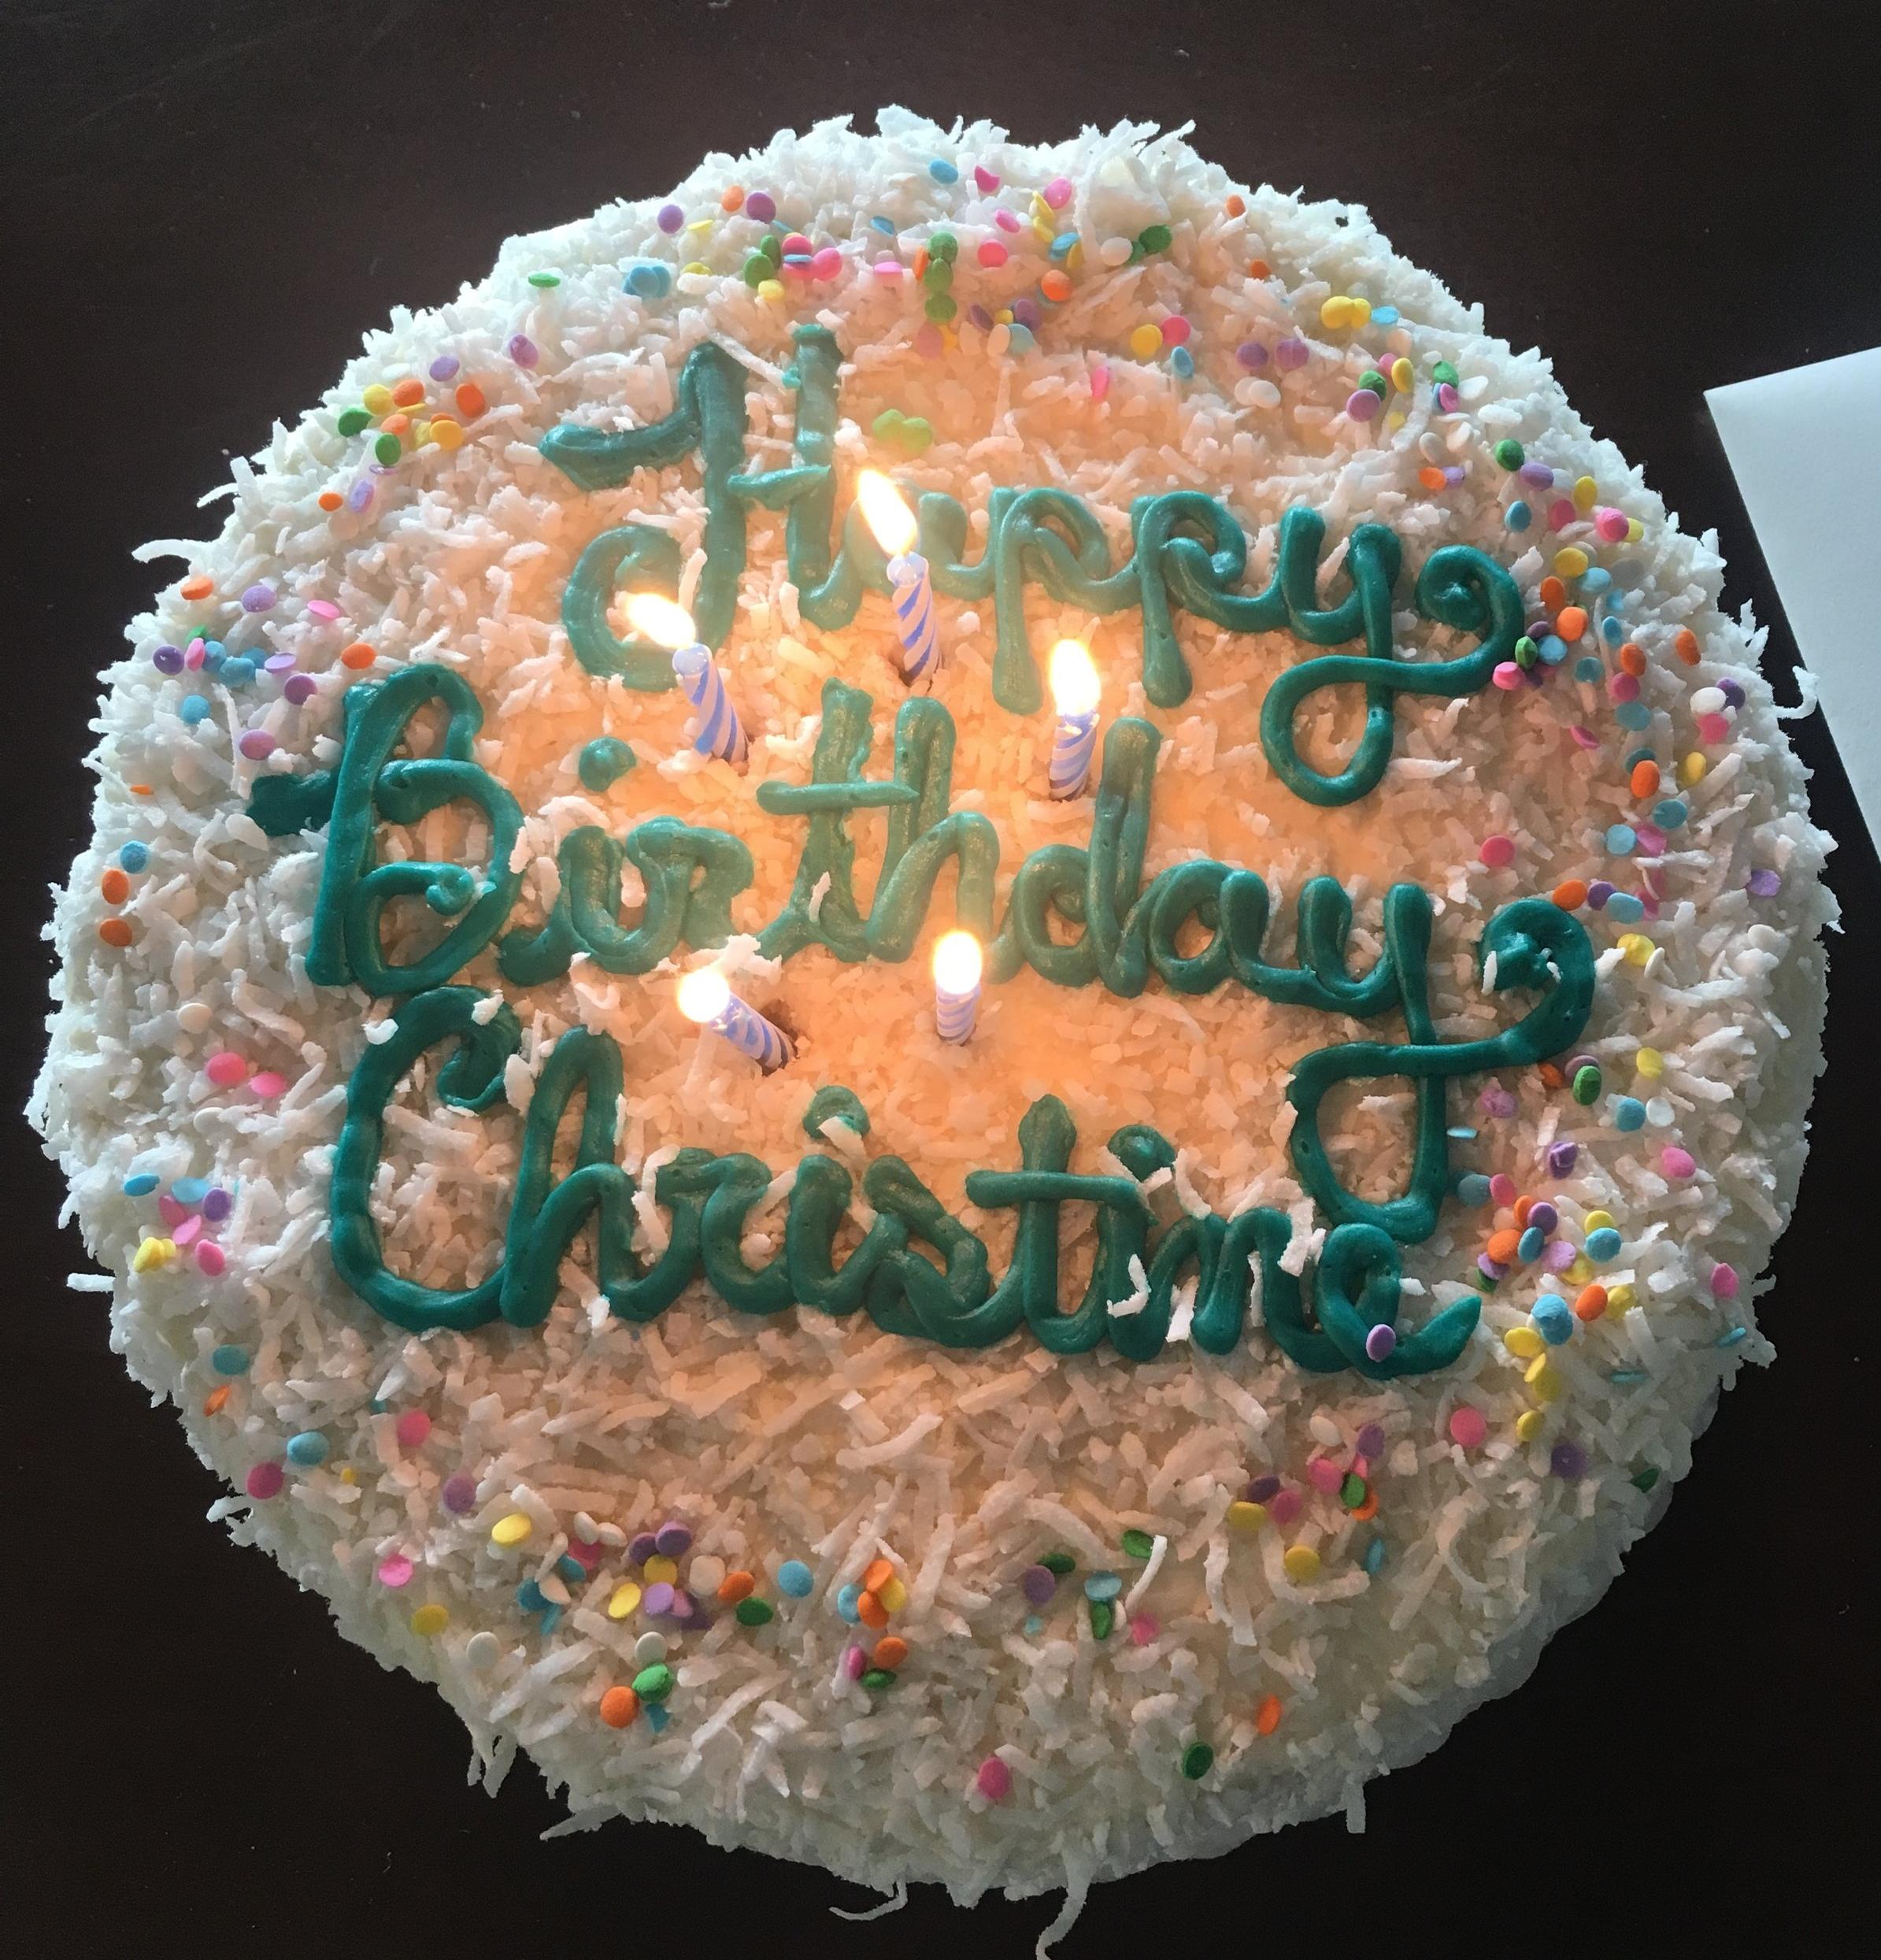 Happy Birthday Christine Pickett Design Associates